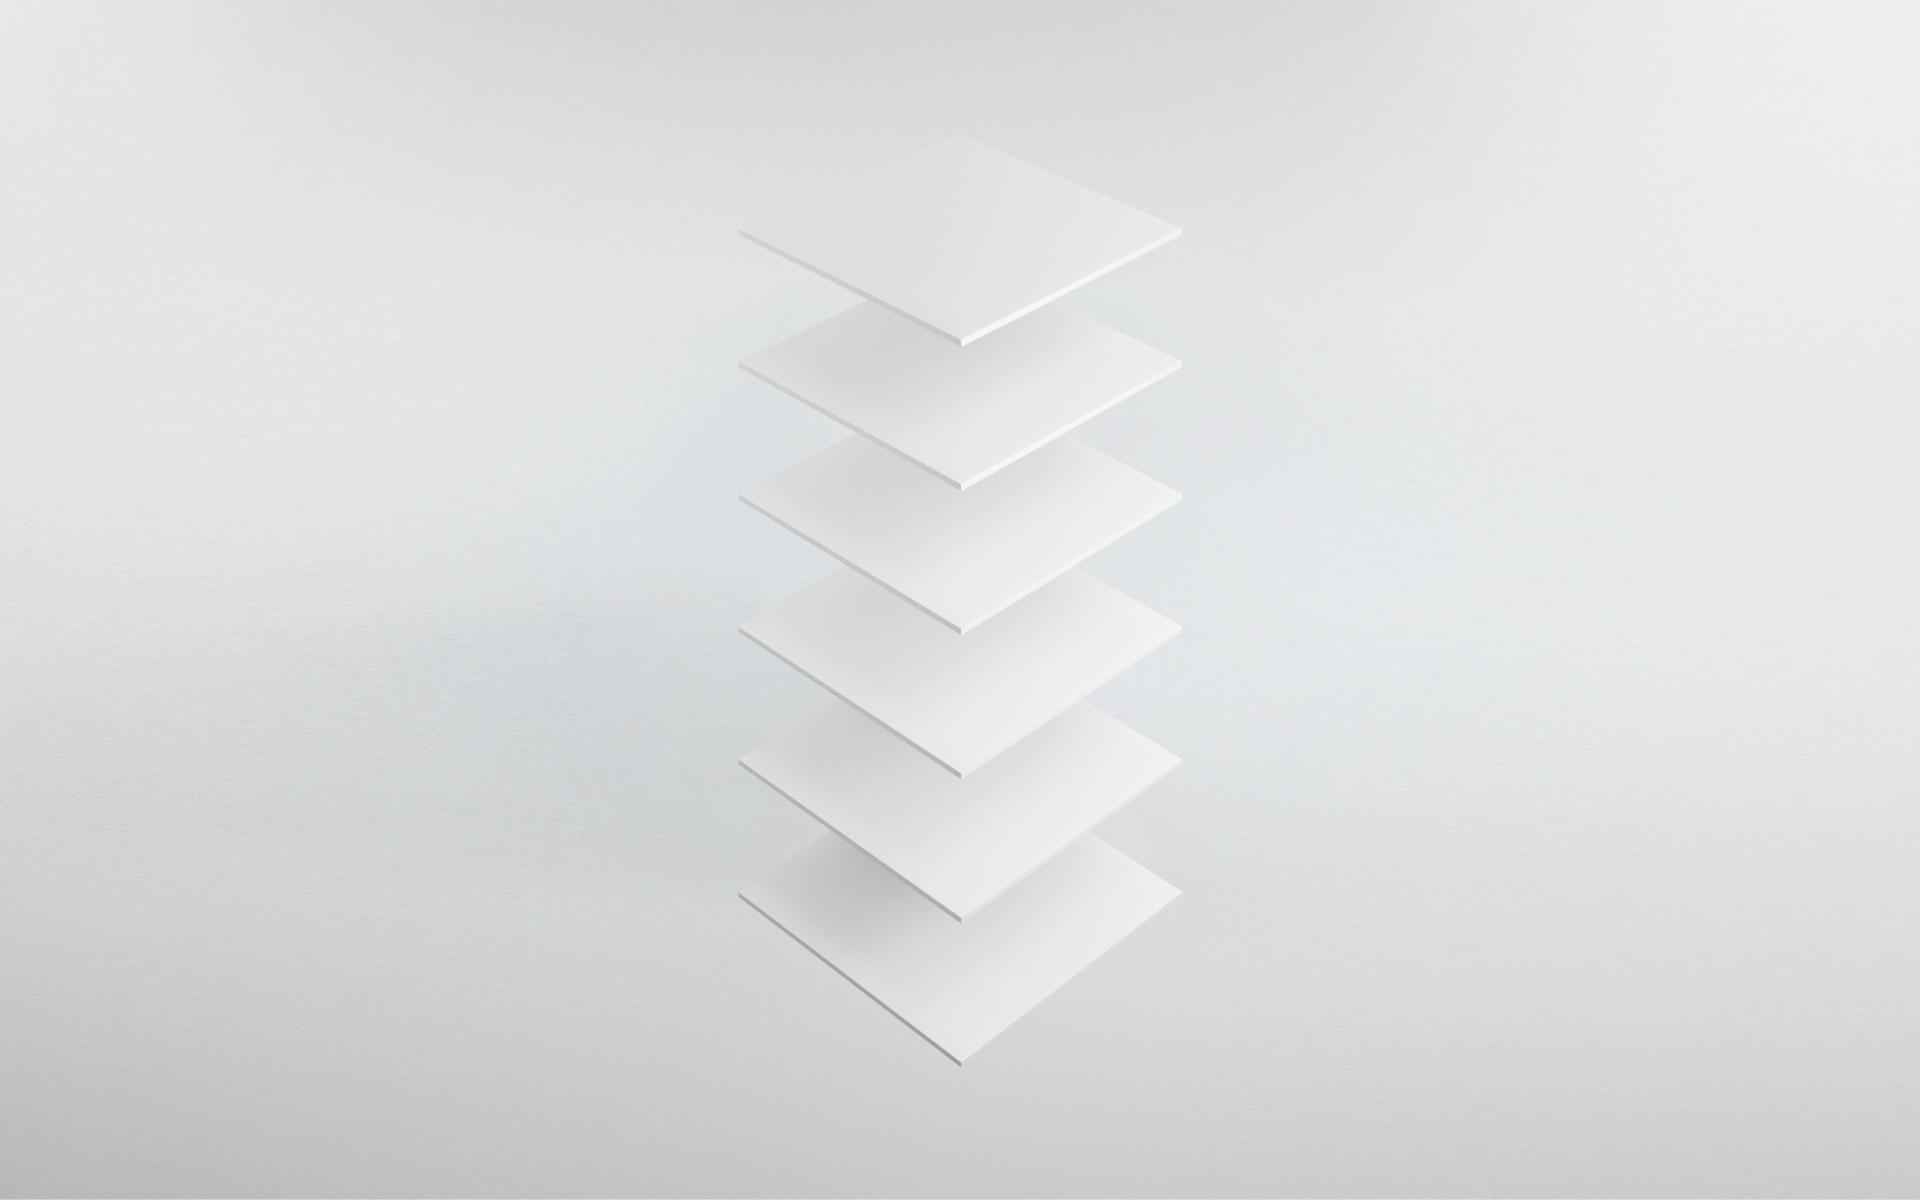 fluidity-summit-hero.jpg